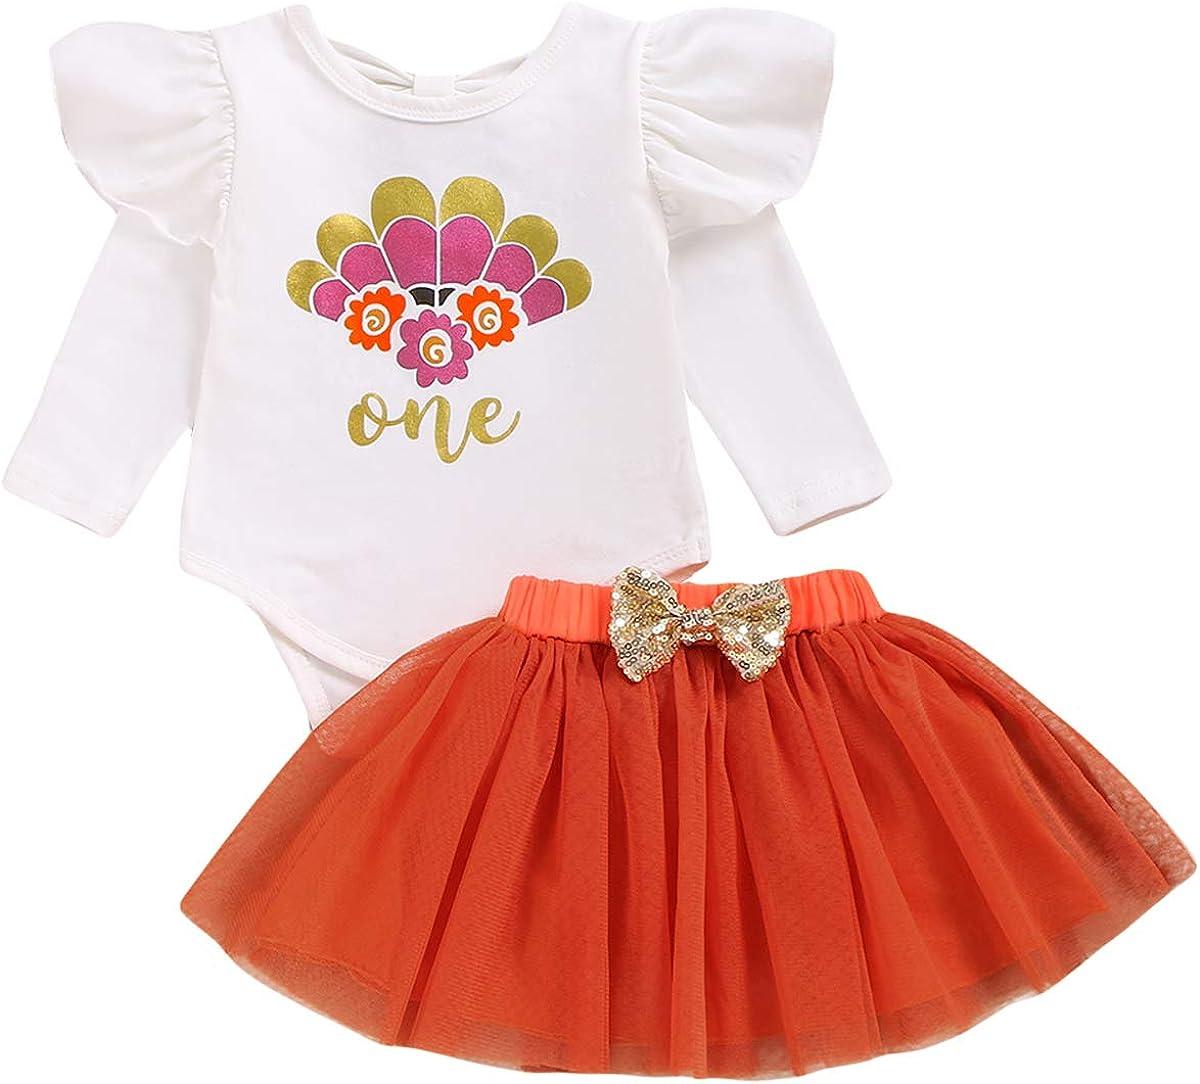 Headband Outfits Tutu Skirt 3Pcs//Set Baby Girl Sequin Long Sleeve Top Shirt